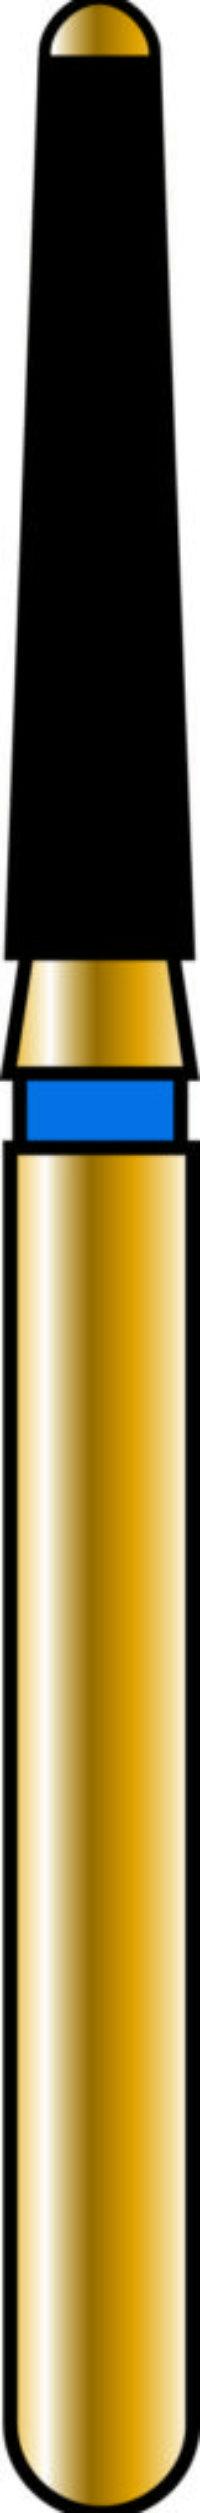 Safe End Rounded Taper 16-8mm Gold Diamond Bur - Coarse Grit